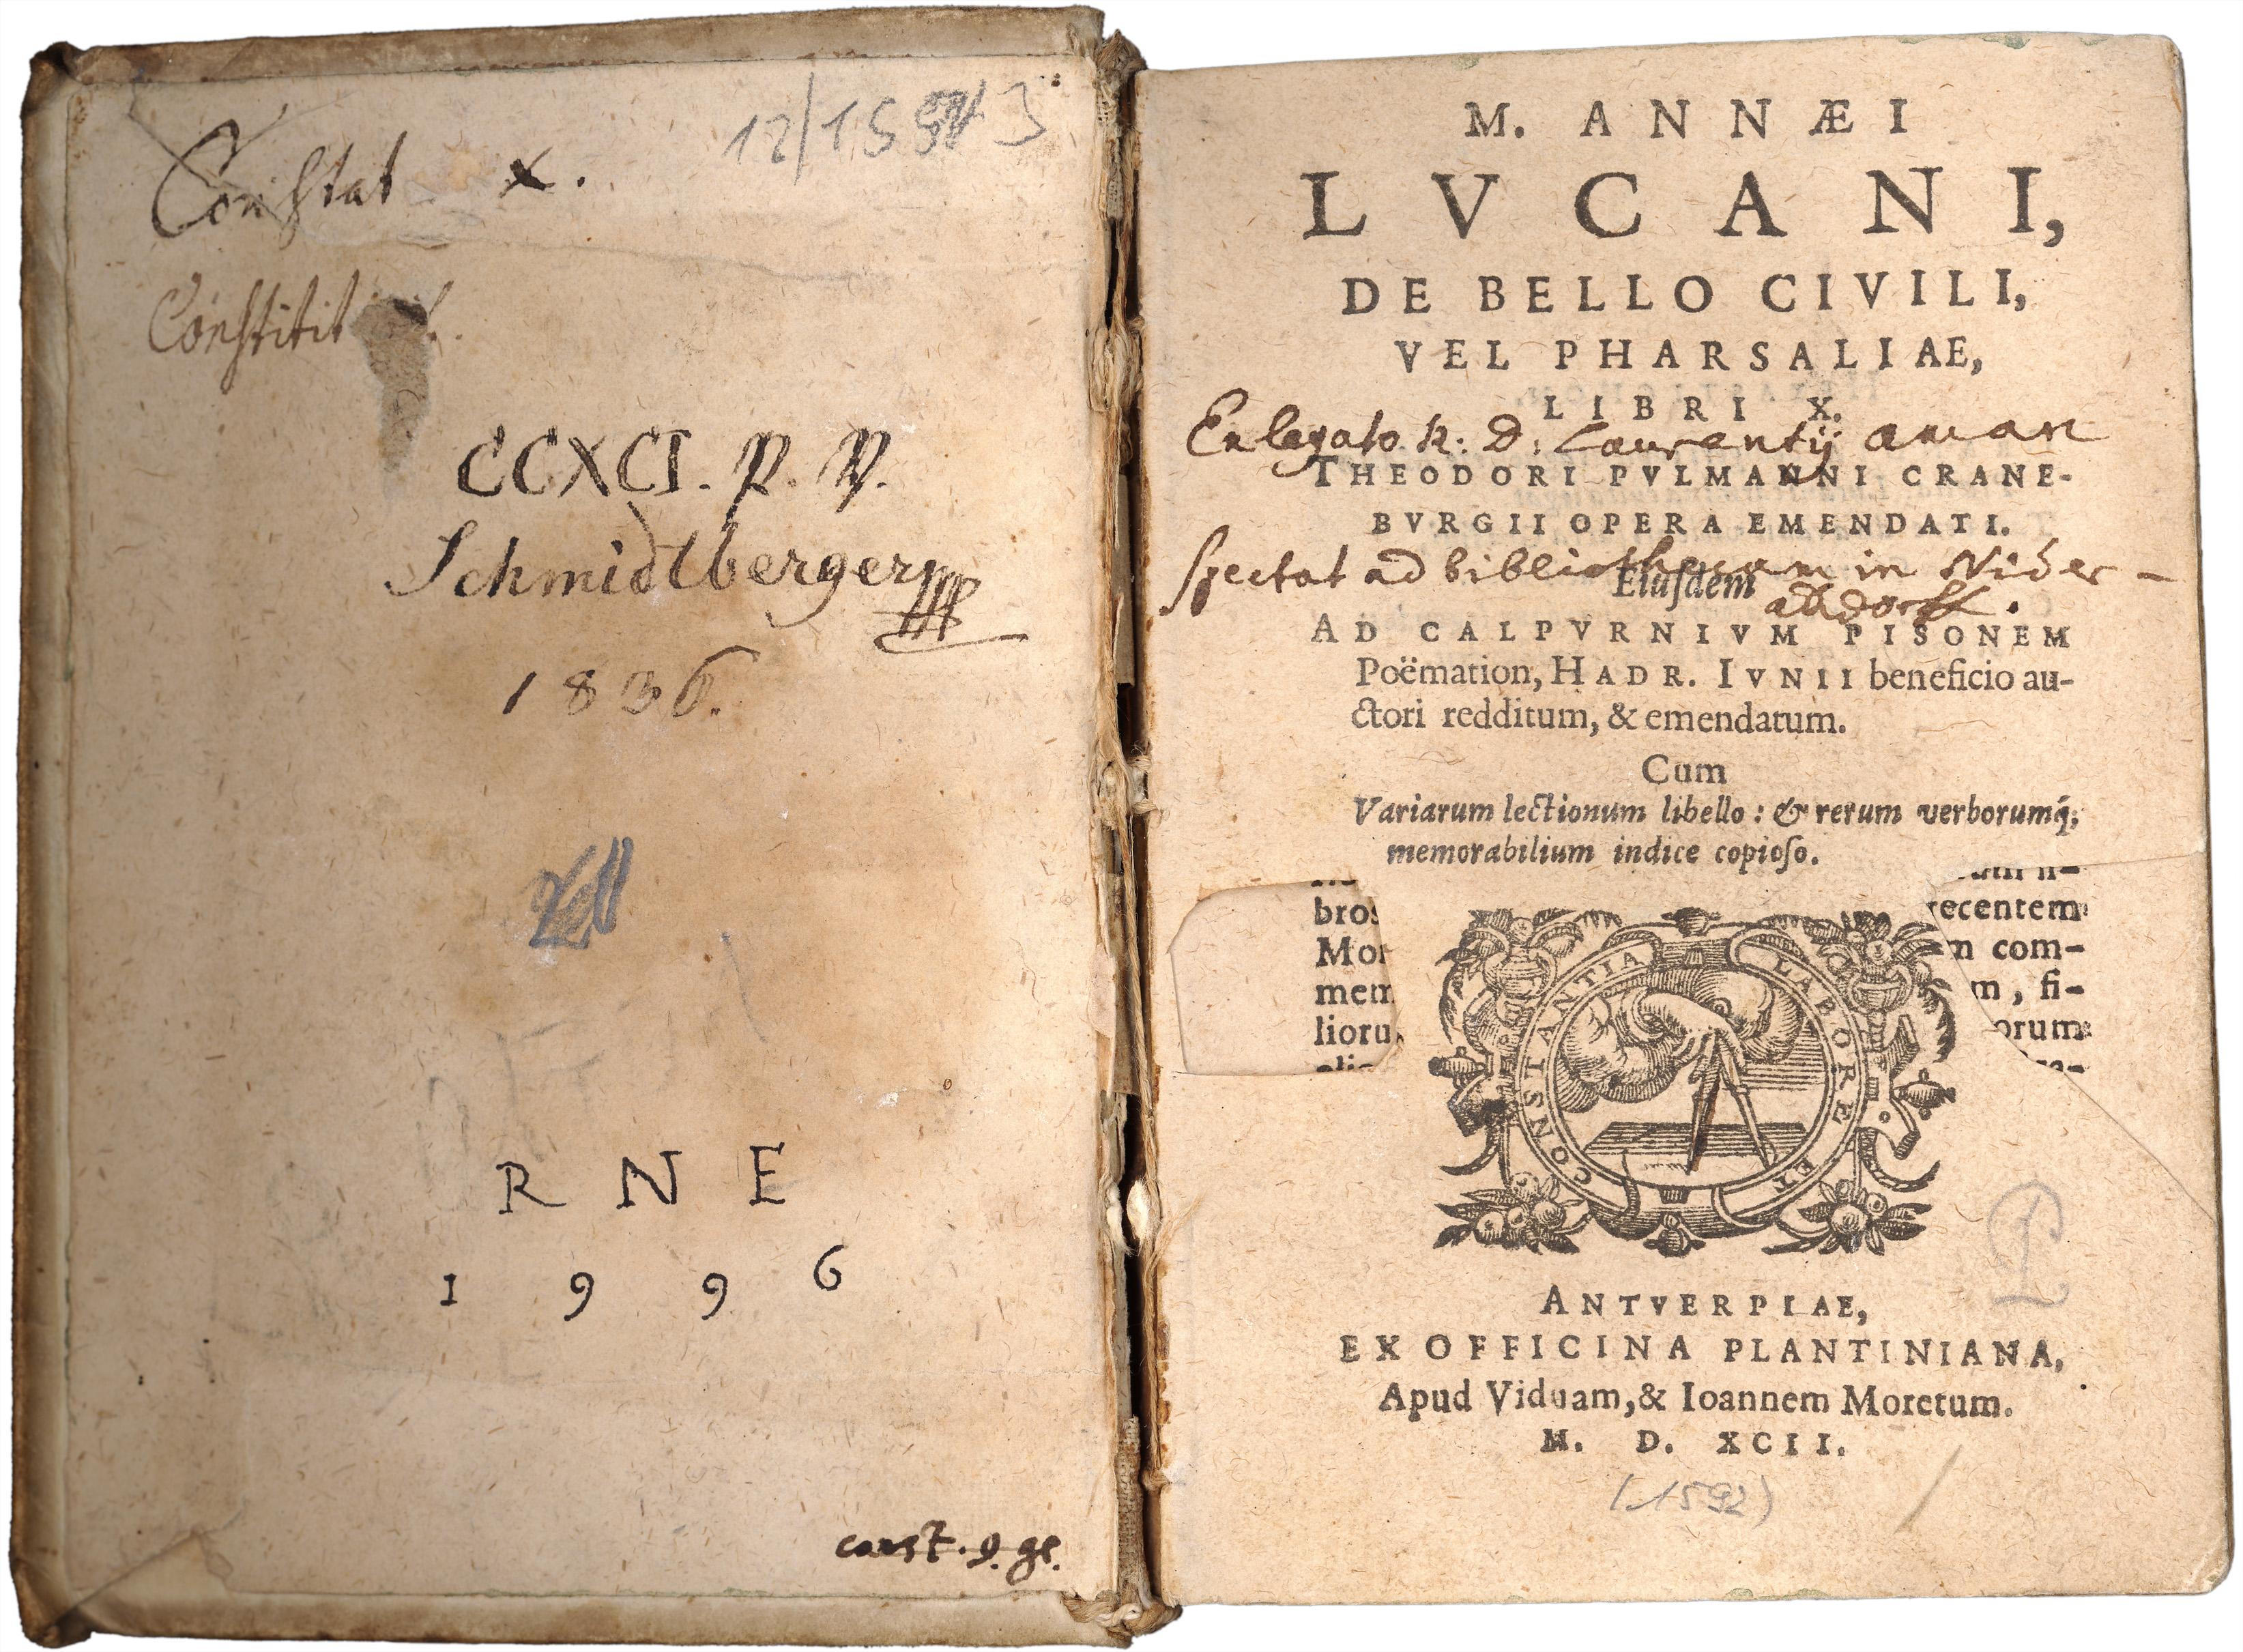 [Image: Lucanus,_De_bello_civili_ed._Pulmann_(Pl...e_page.jpg]